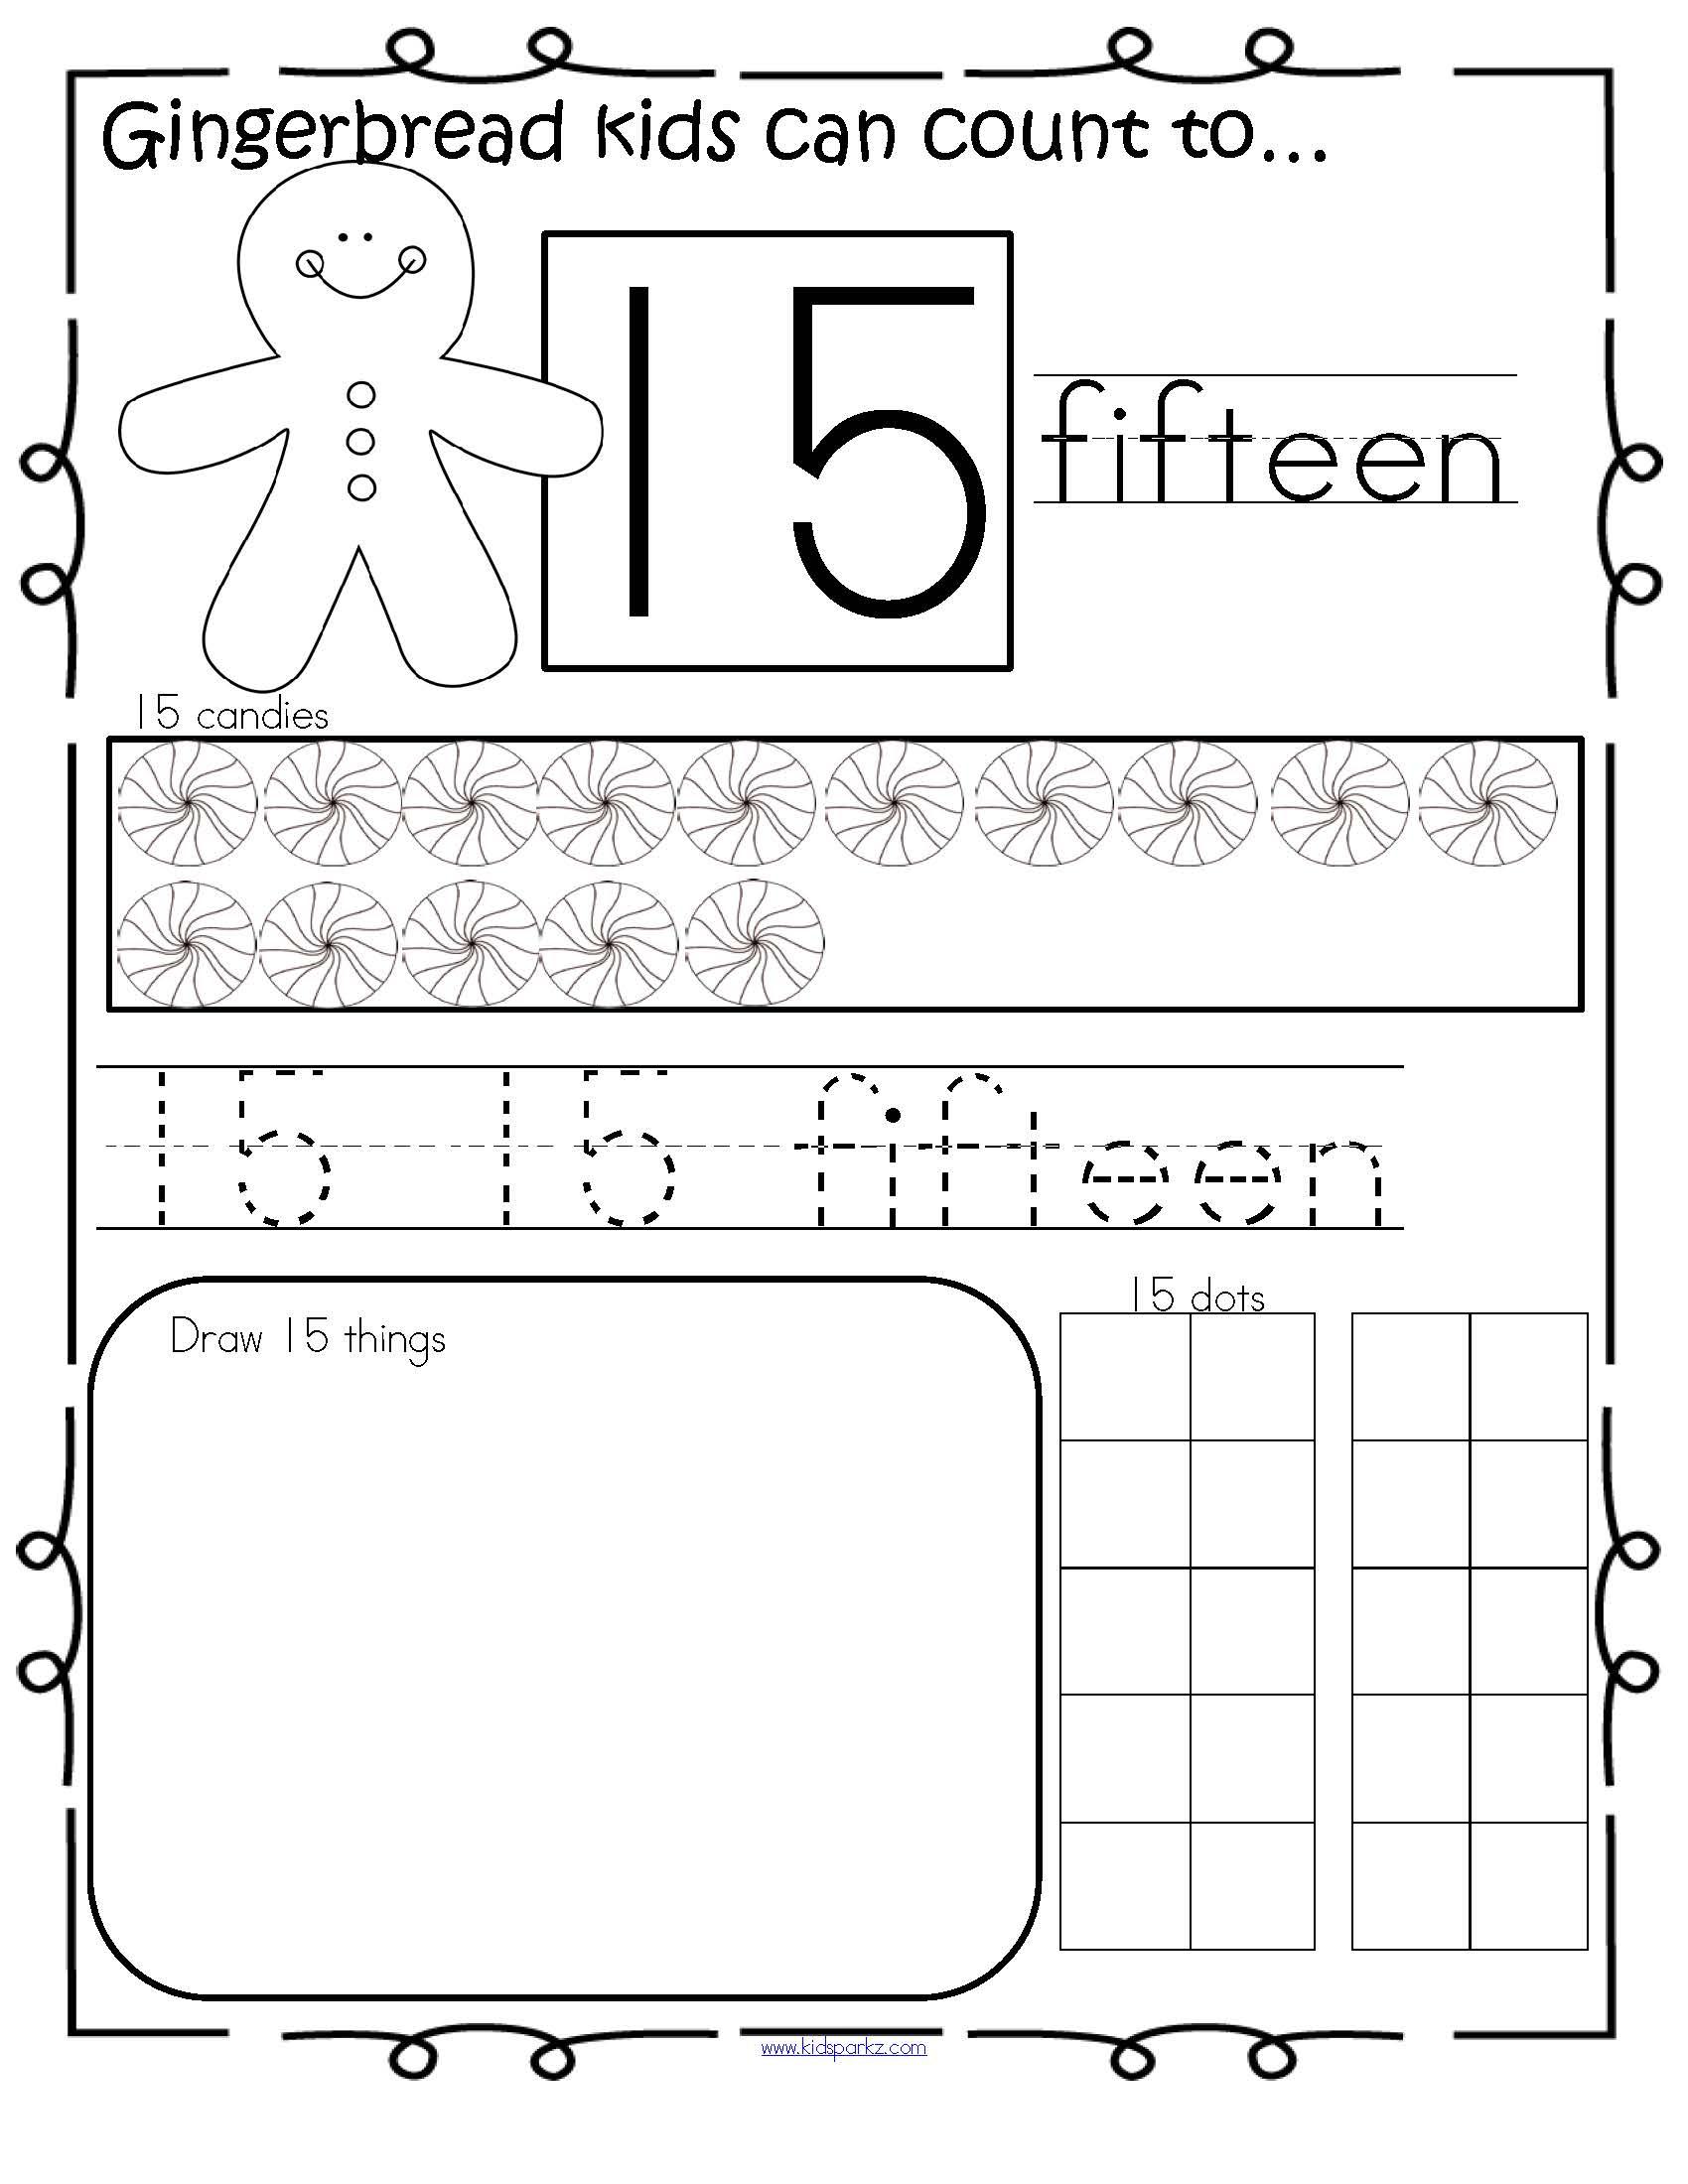 Gingerbread Kids Number Practice Printables